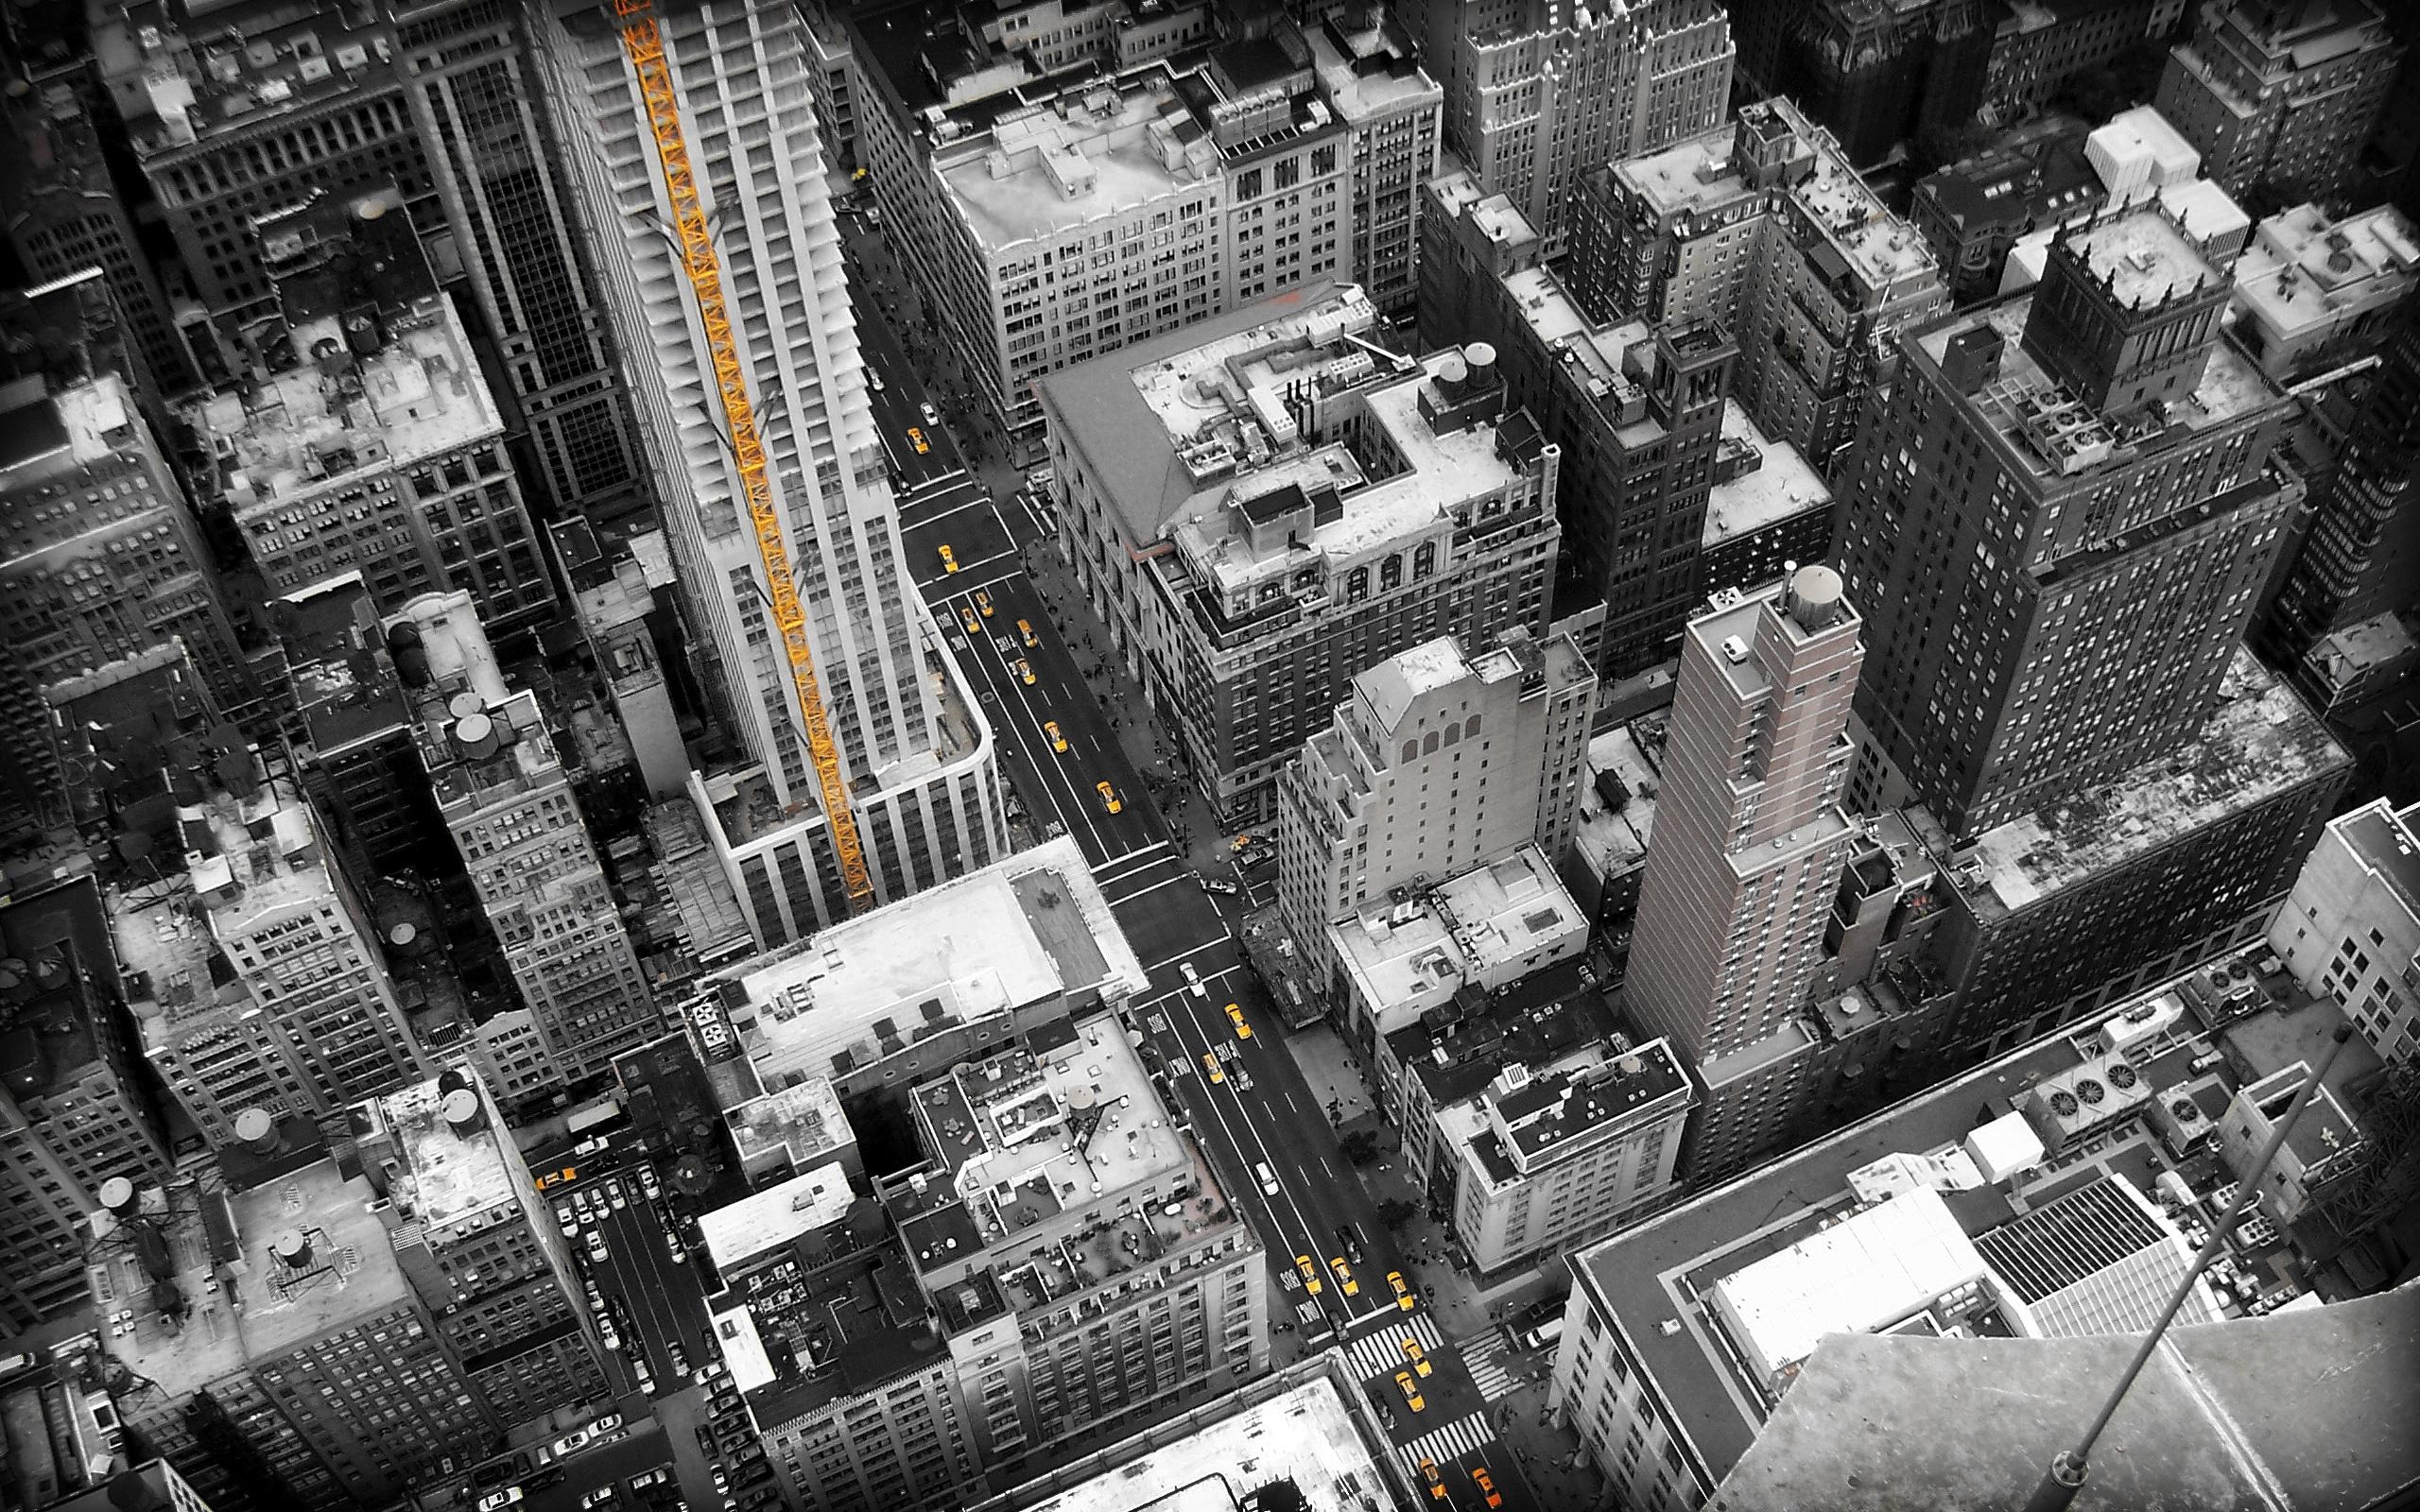 1920x1080 wallpaper city black - photo #19